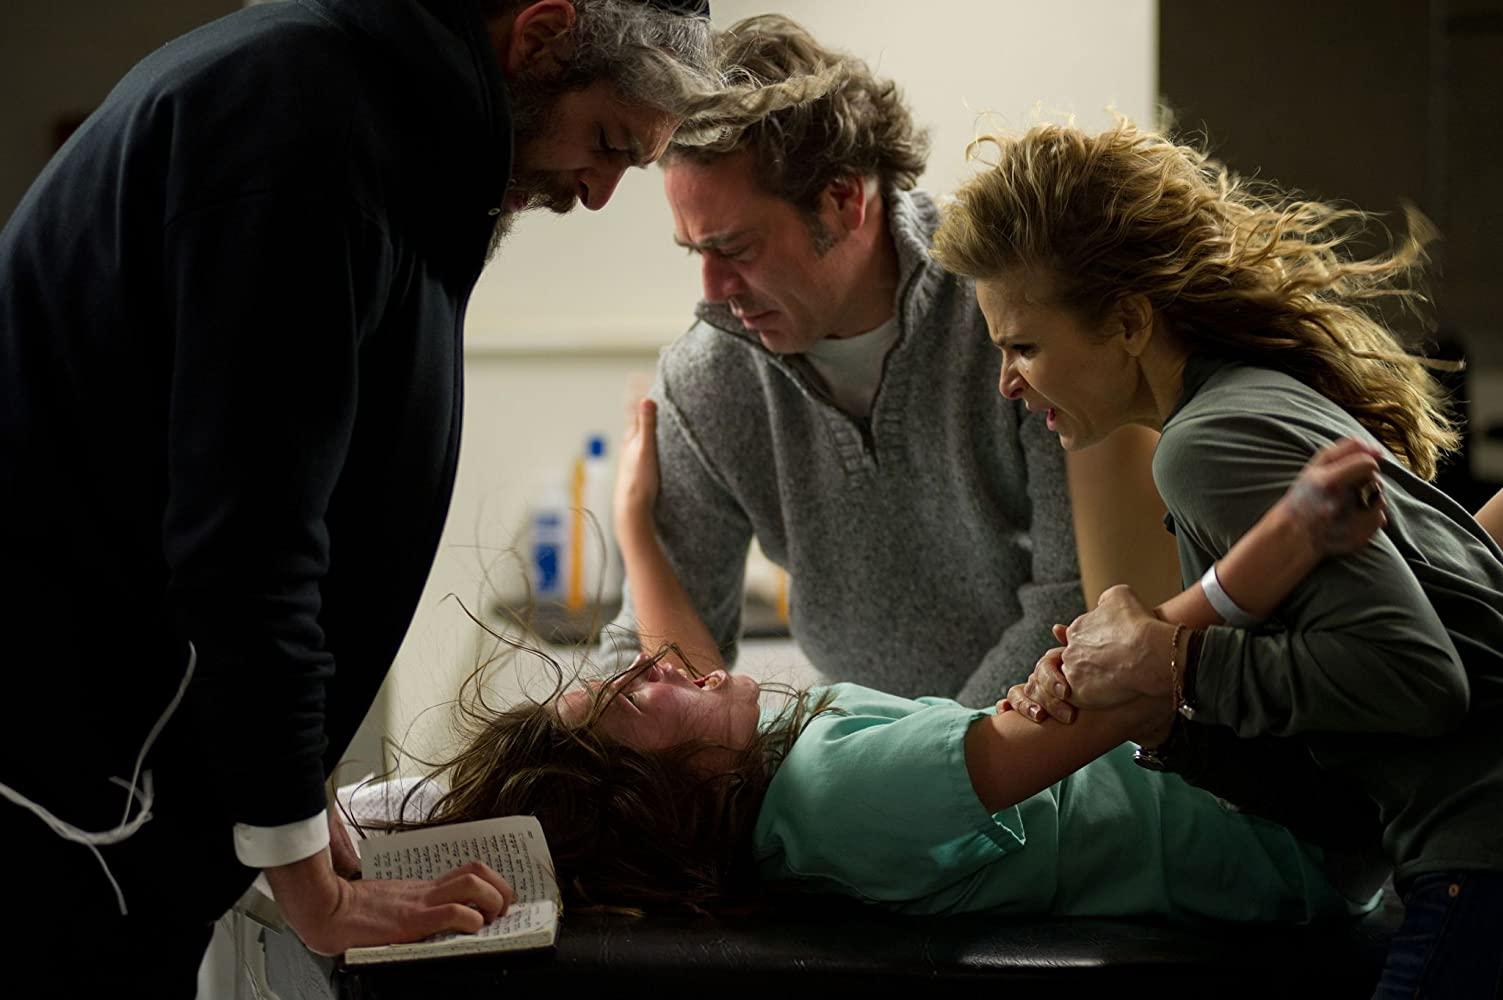 Rabbi Matisyahu, Jeffrey Dean Morgan and Kyra Sedgwick hold down Natasha Calis in The Possession (2012)